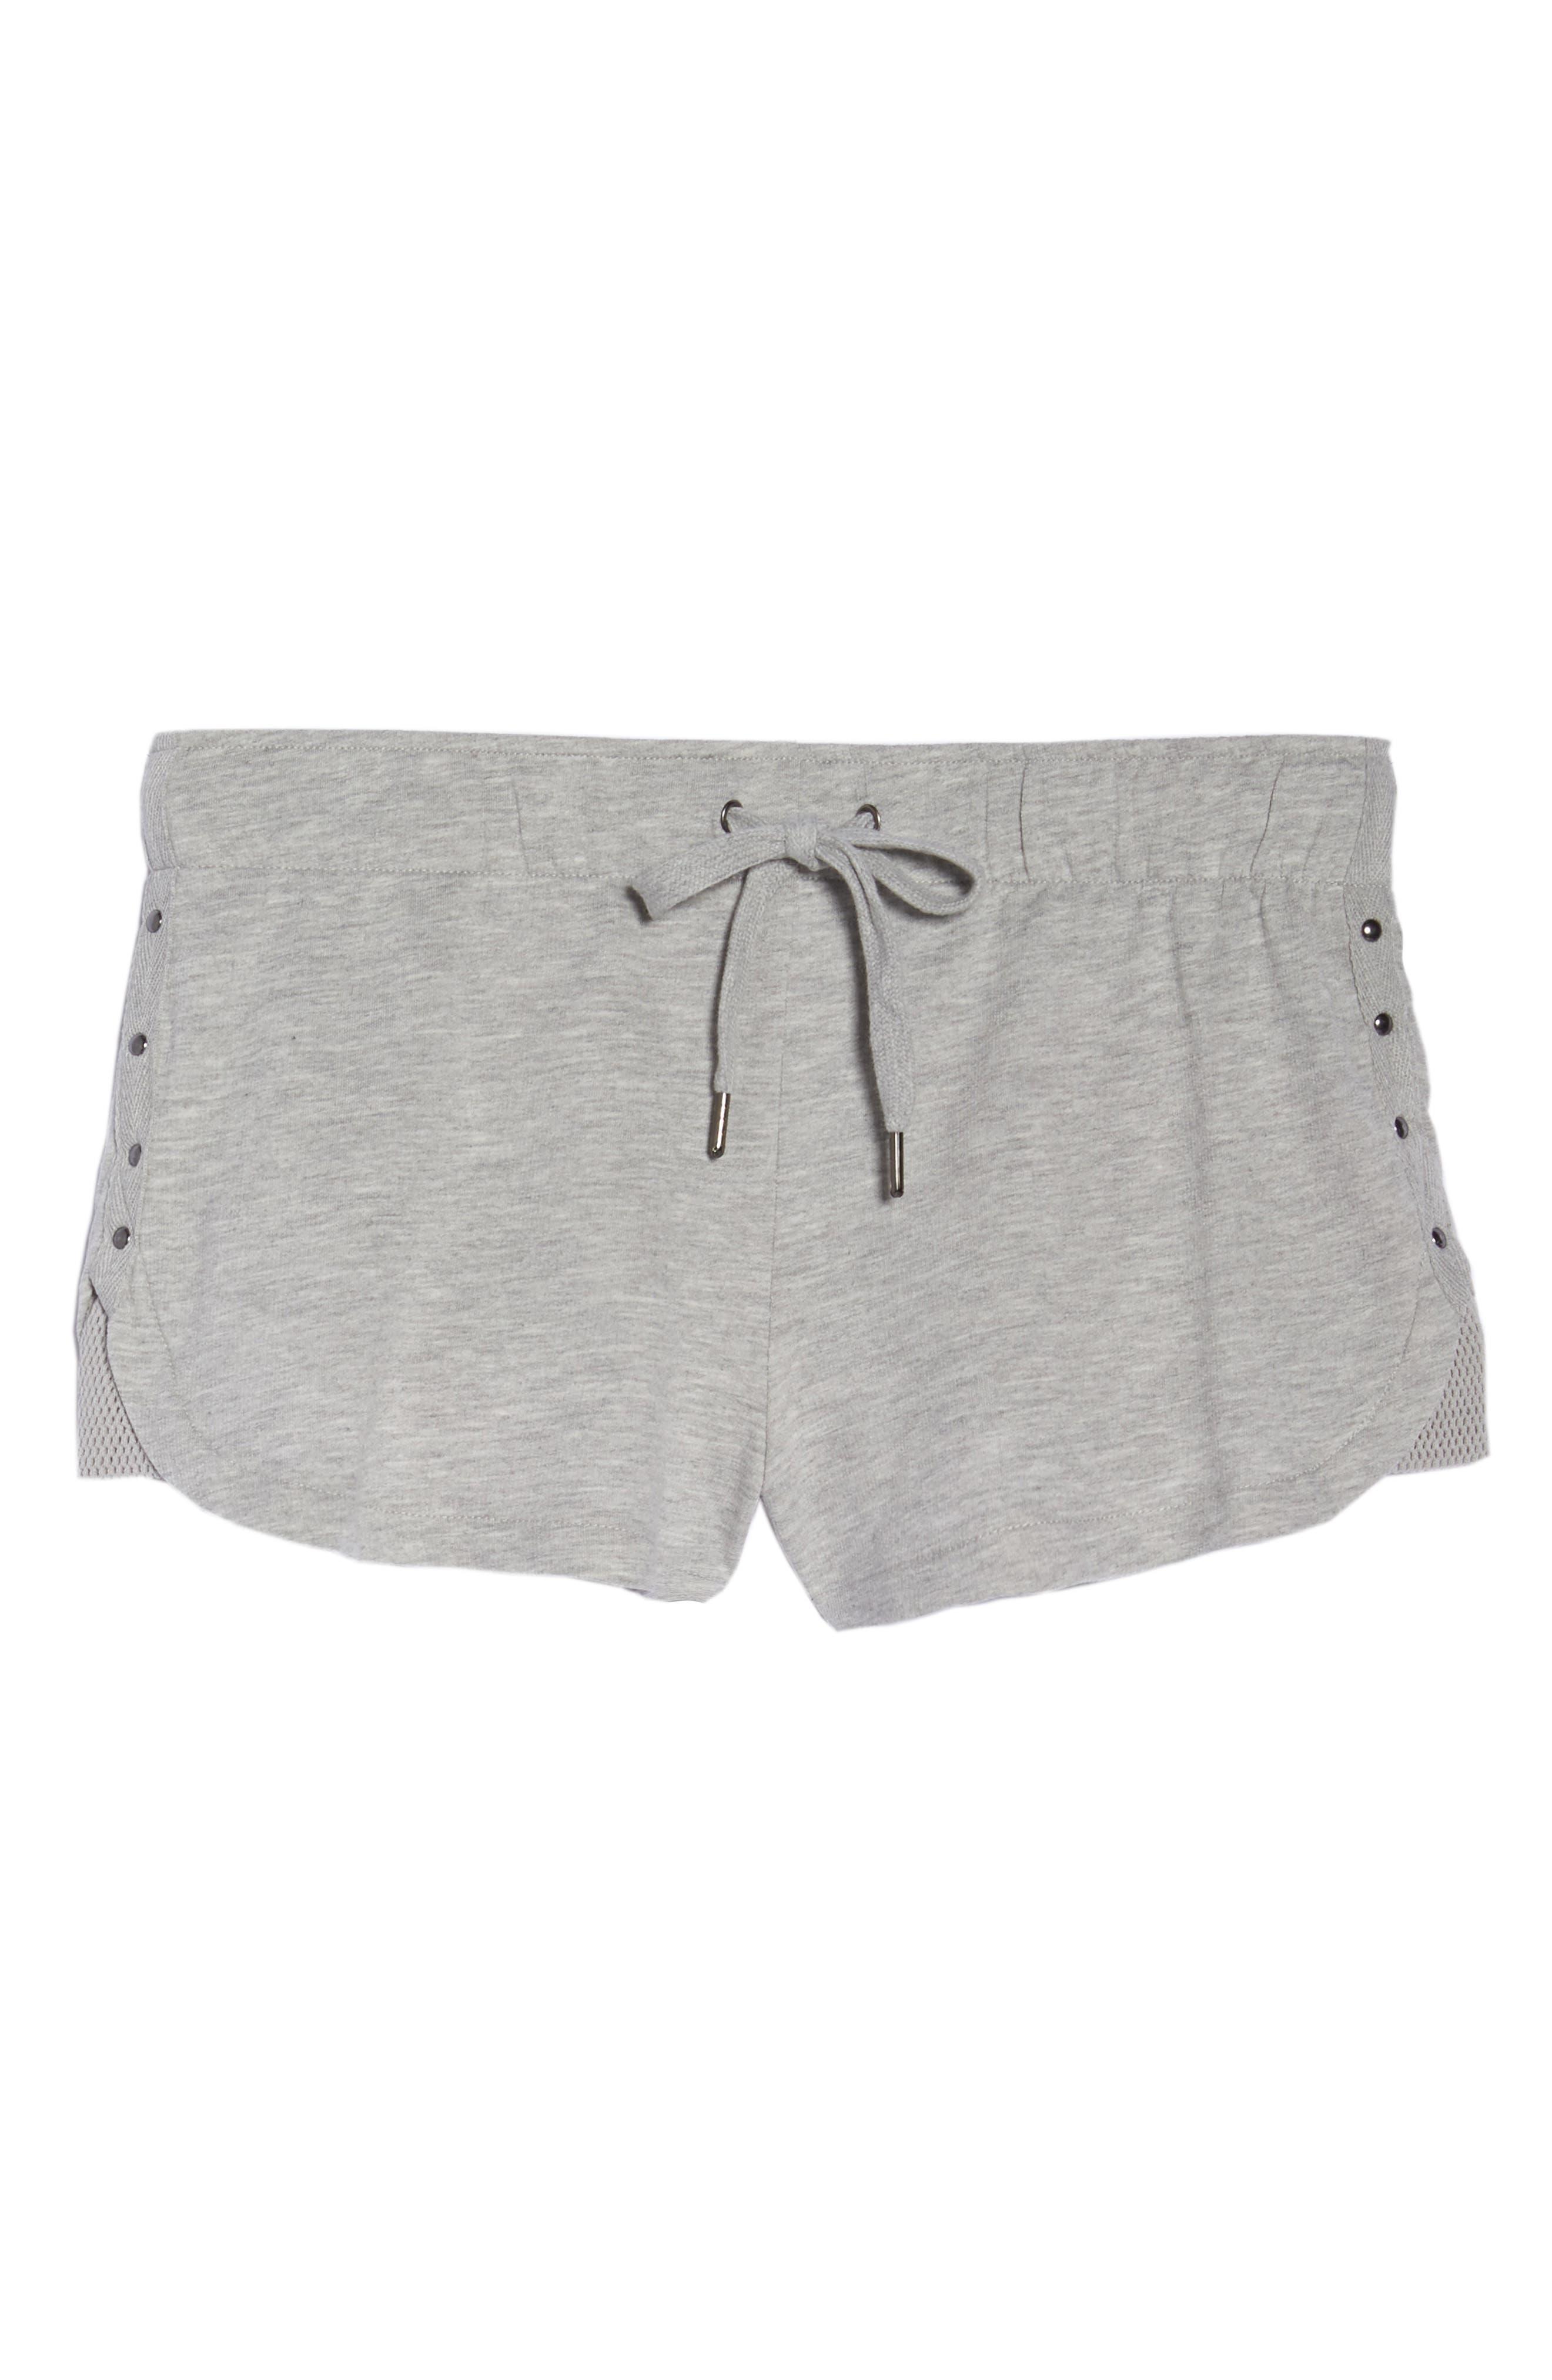 Pajama Shorts,                             Alternate thumbnail 6, color,                             020